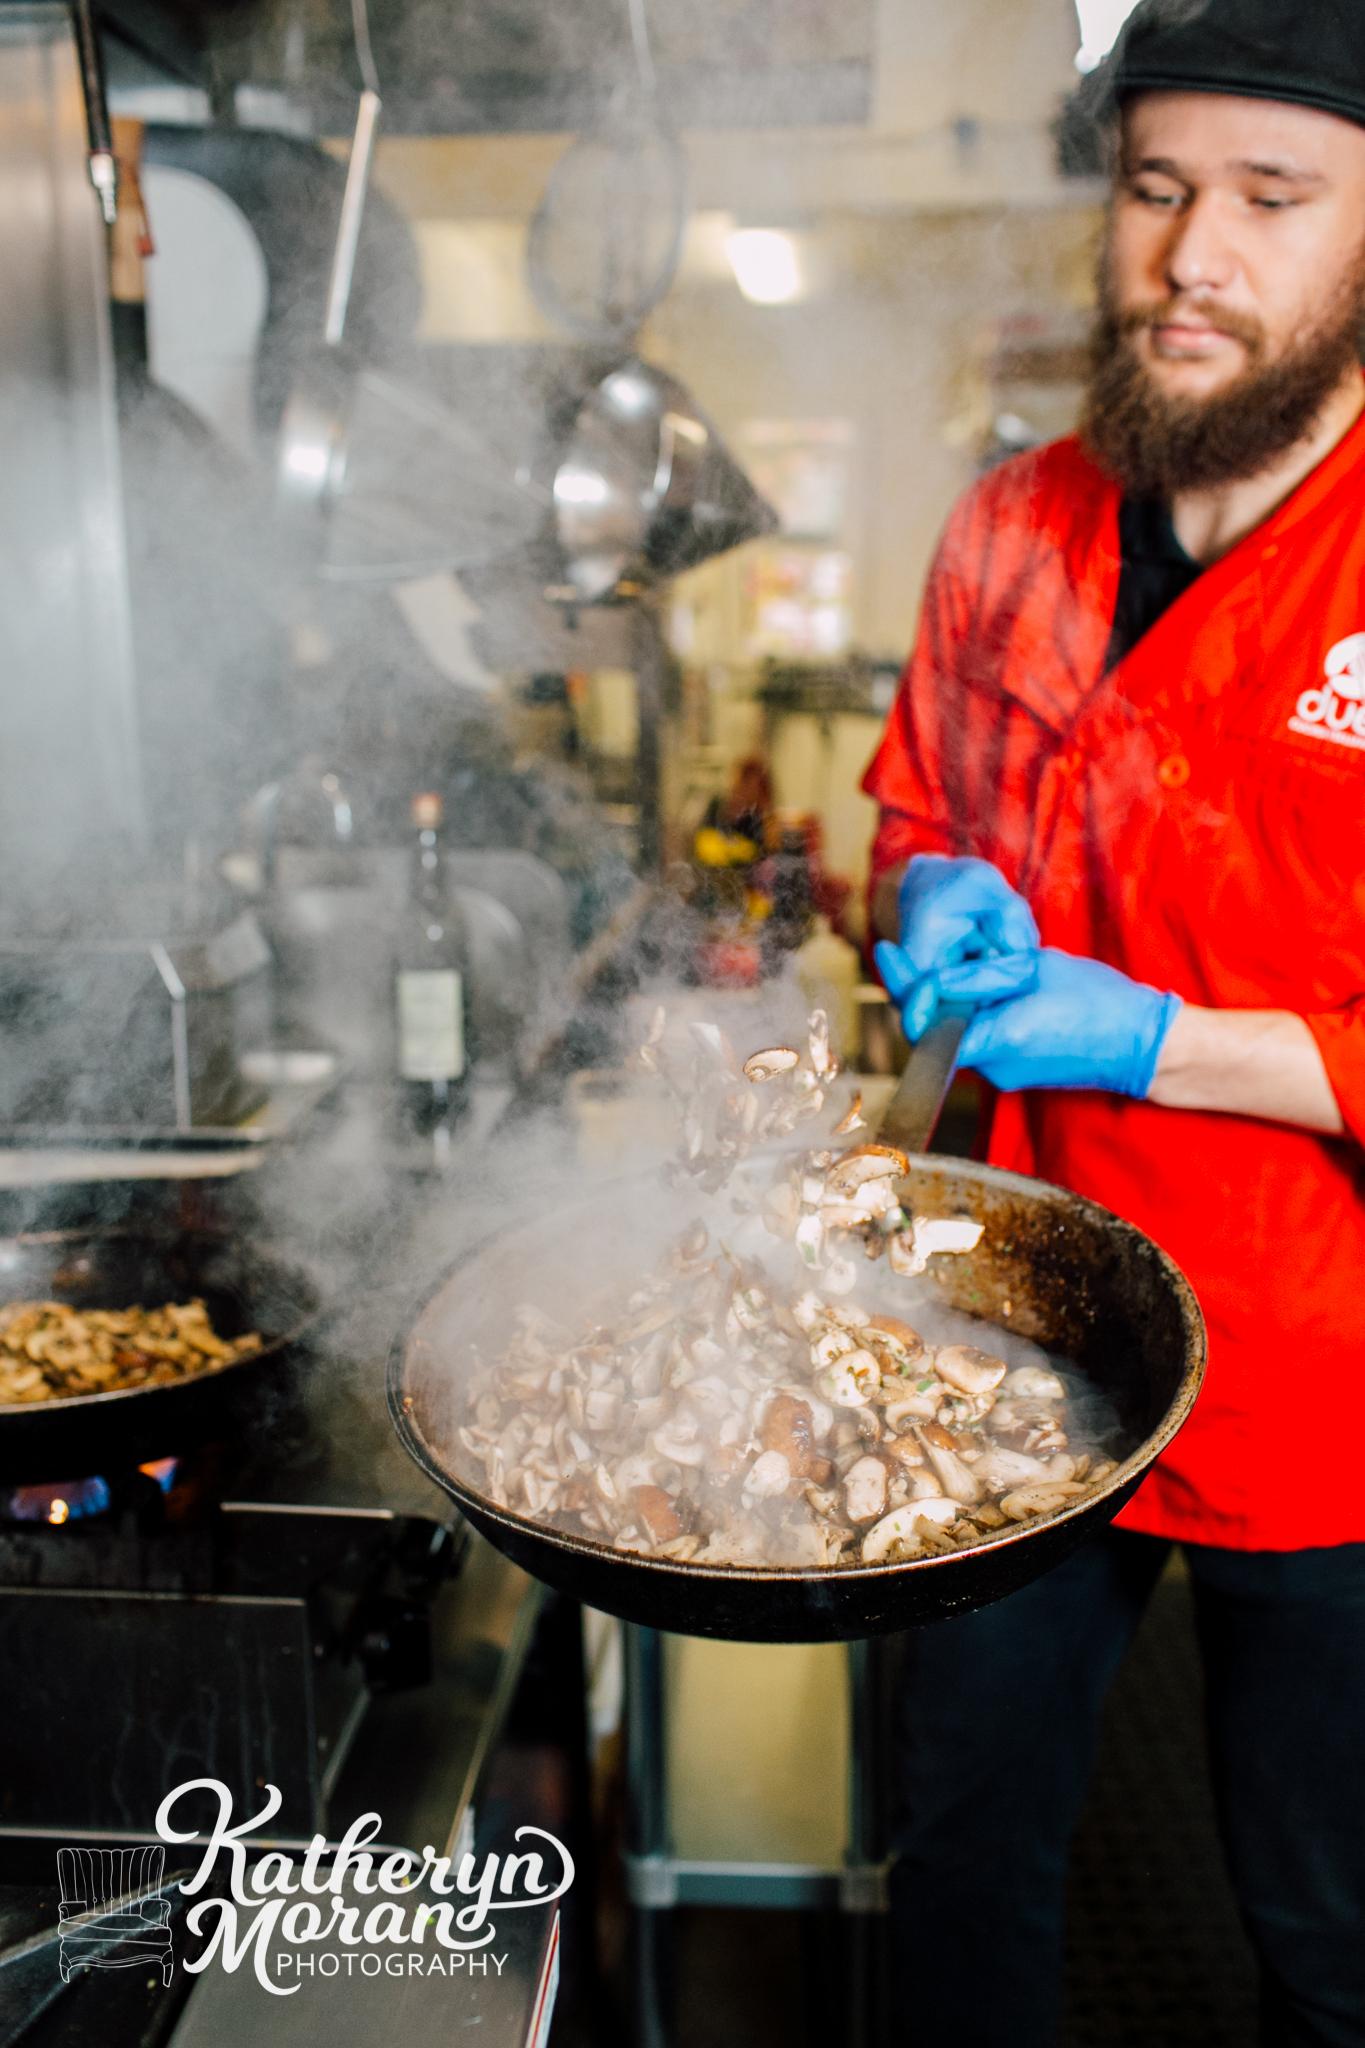 seattle-food-photographer-katheryn-moran-due-cucina-italiana-3.jpg